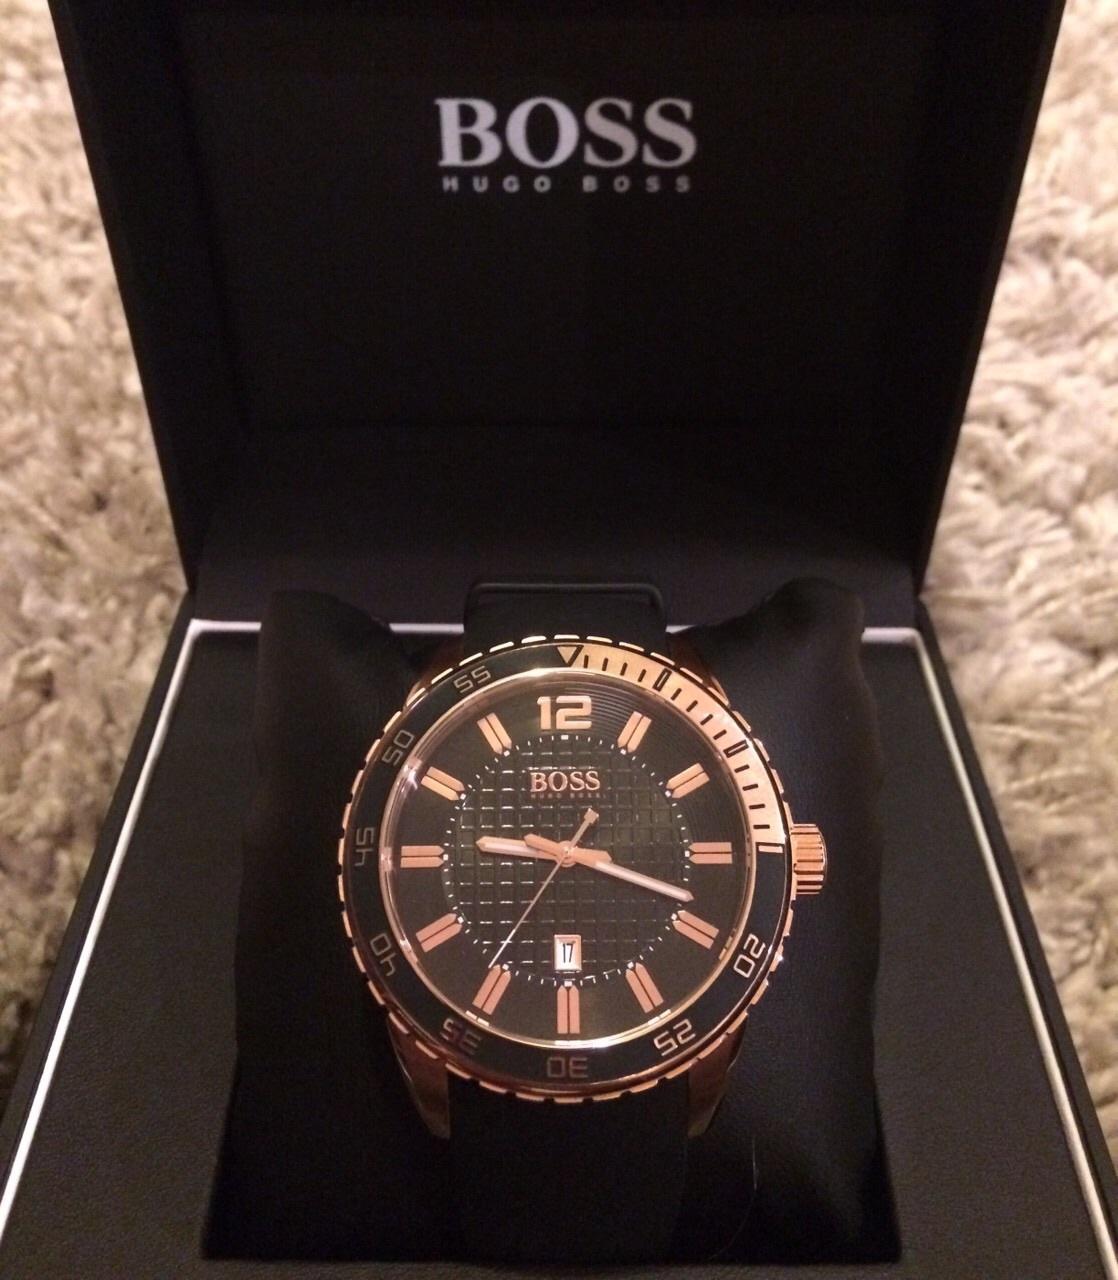 Gents Hugo Boss Watch 1512886 Watchshop Com